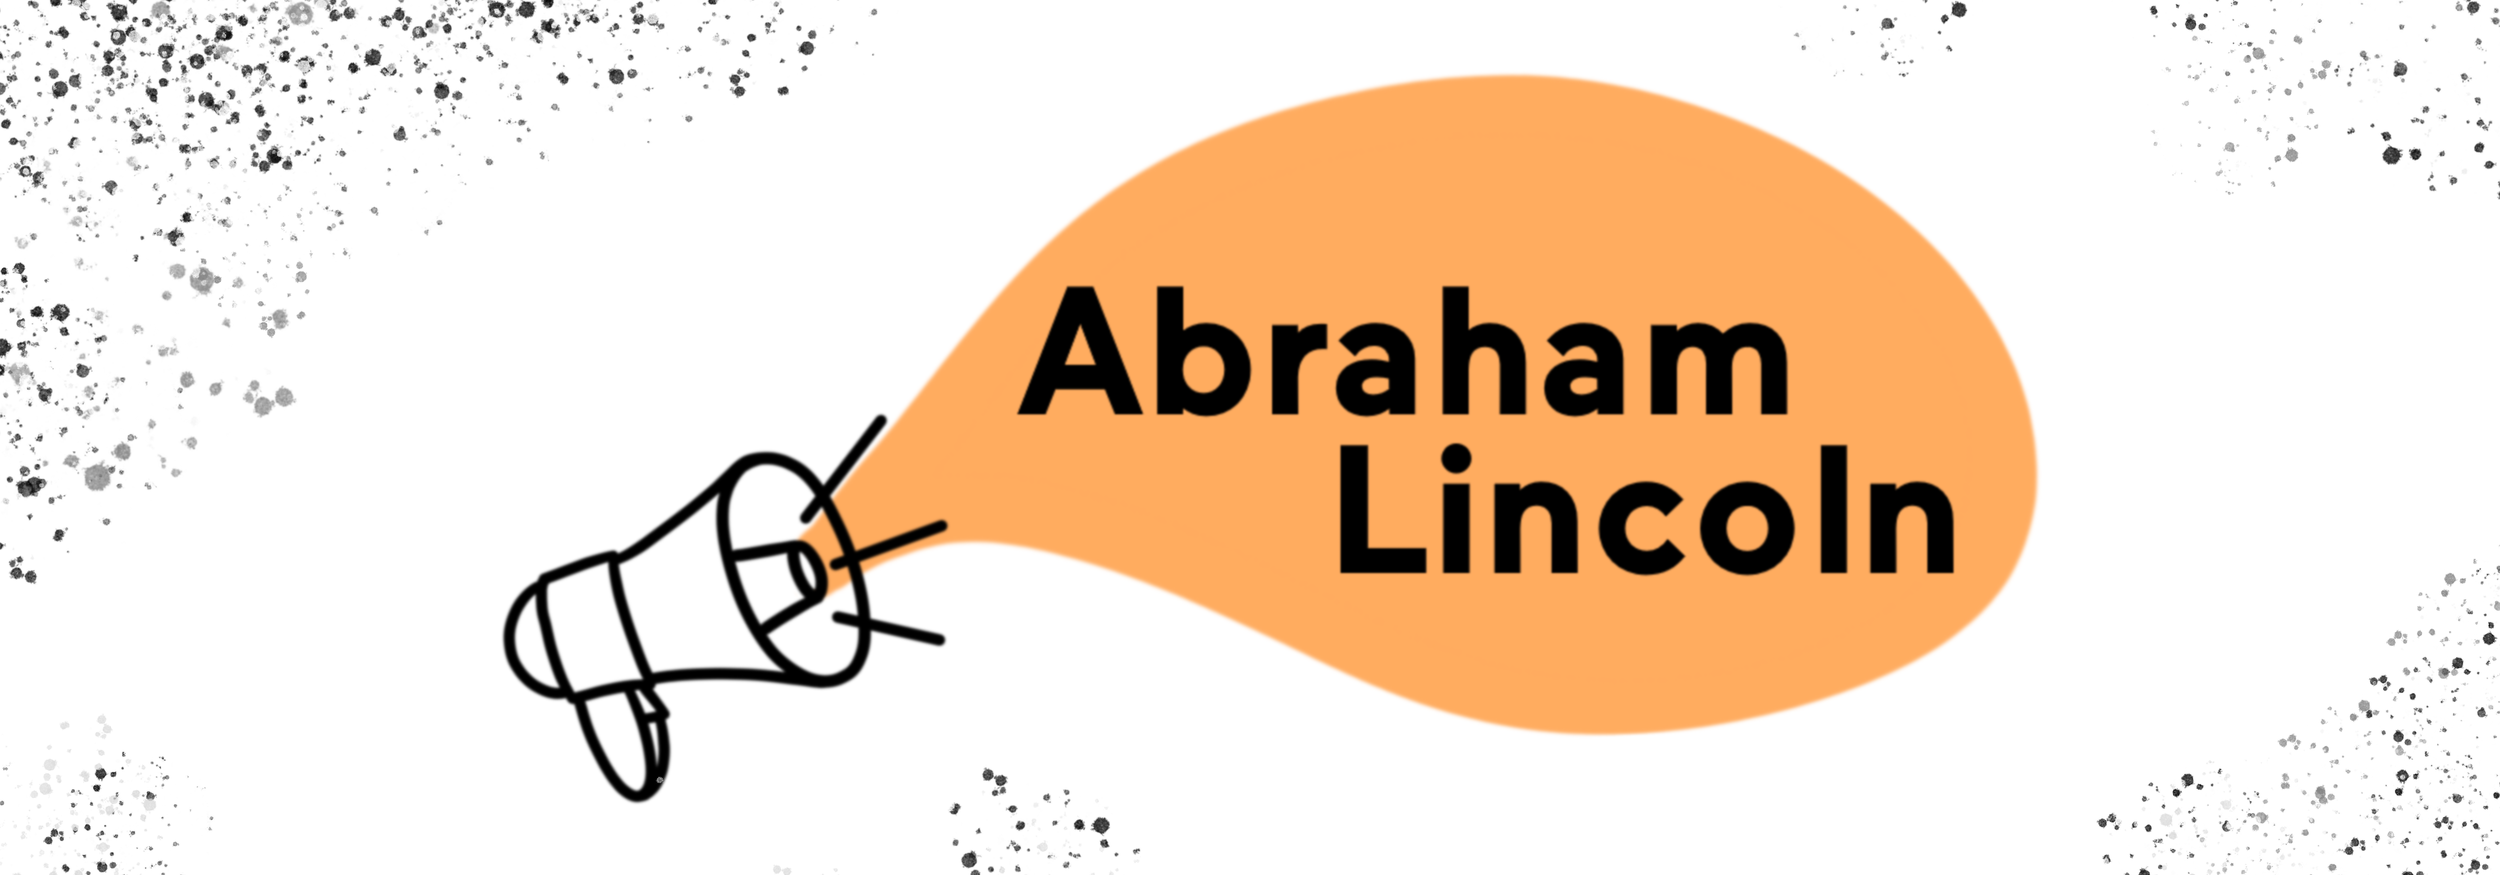 Abraham_Lincoln_Website_Banner.png